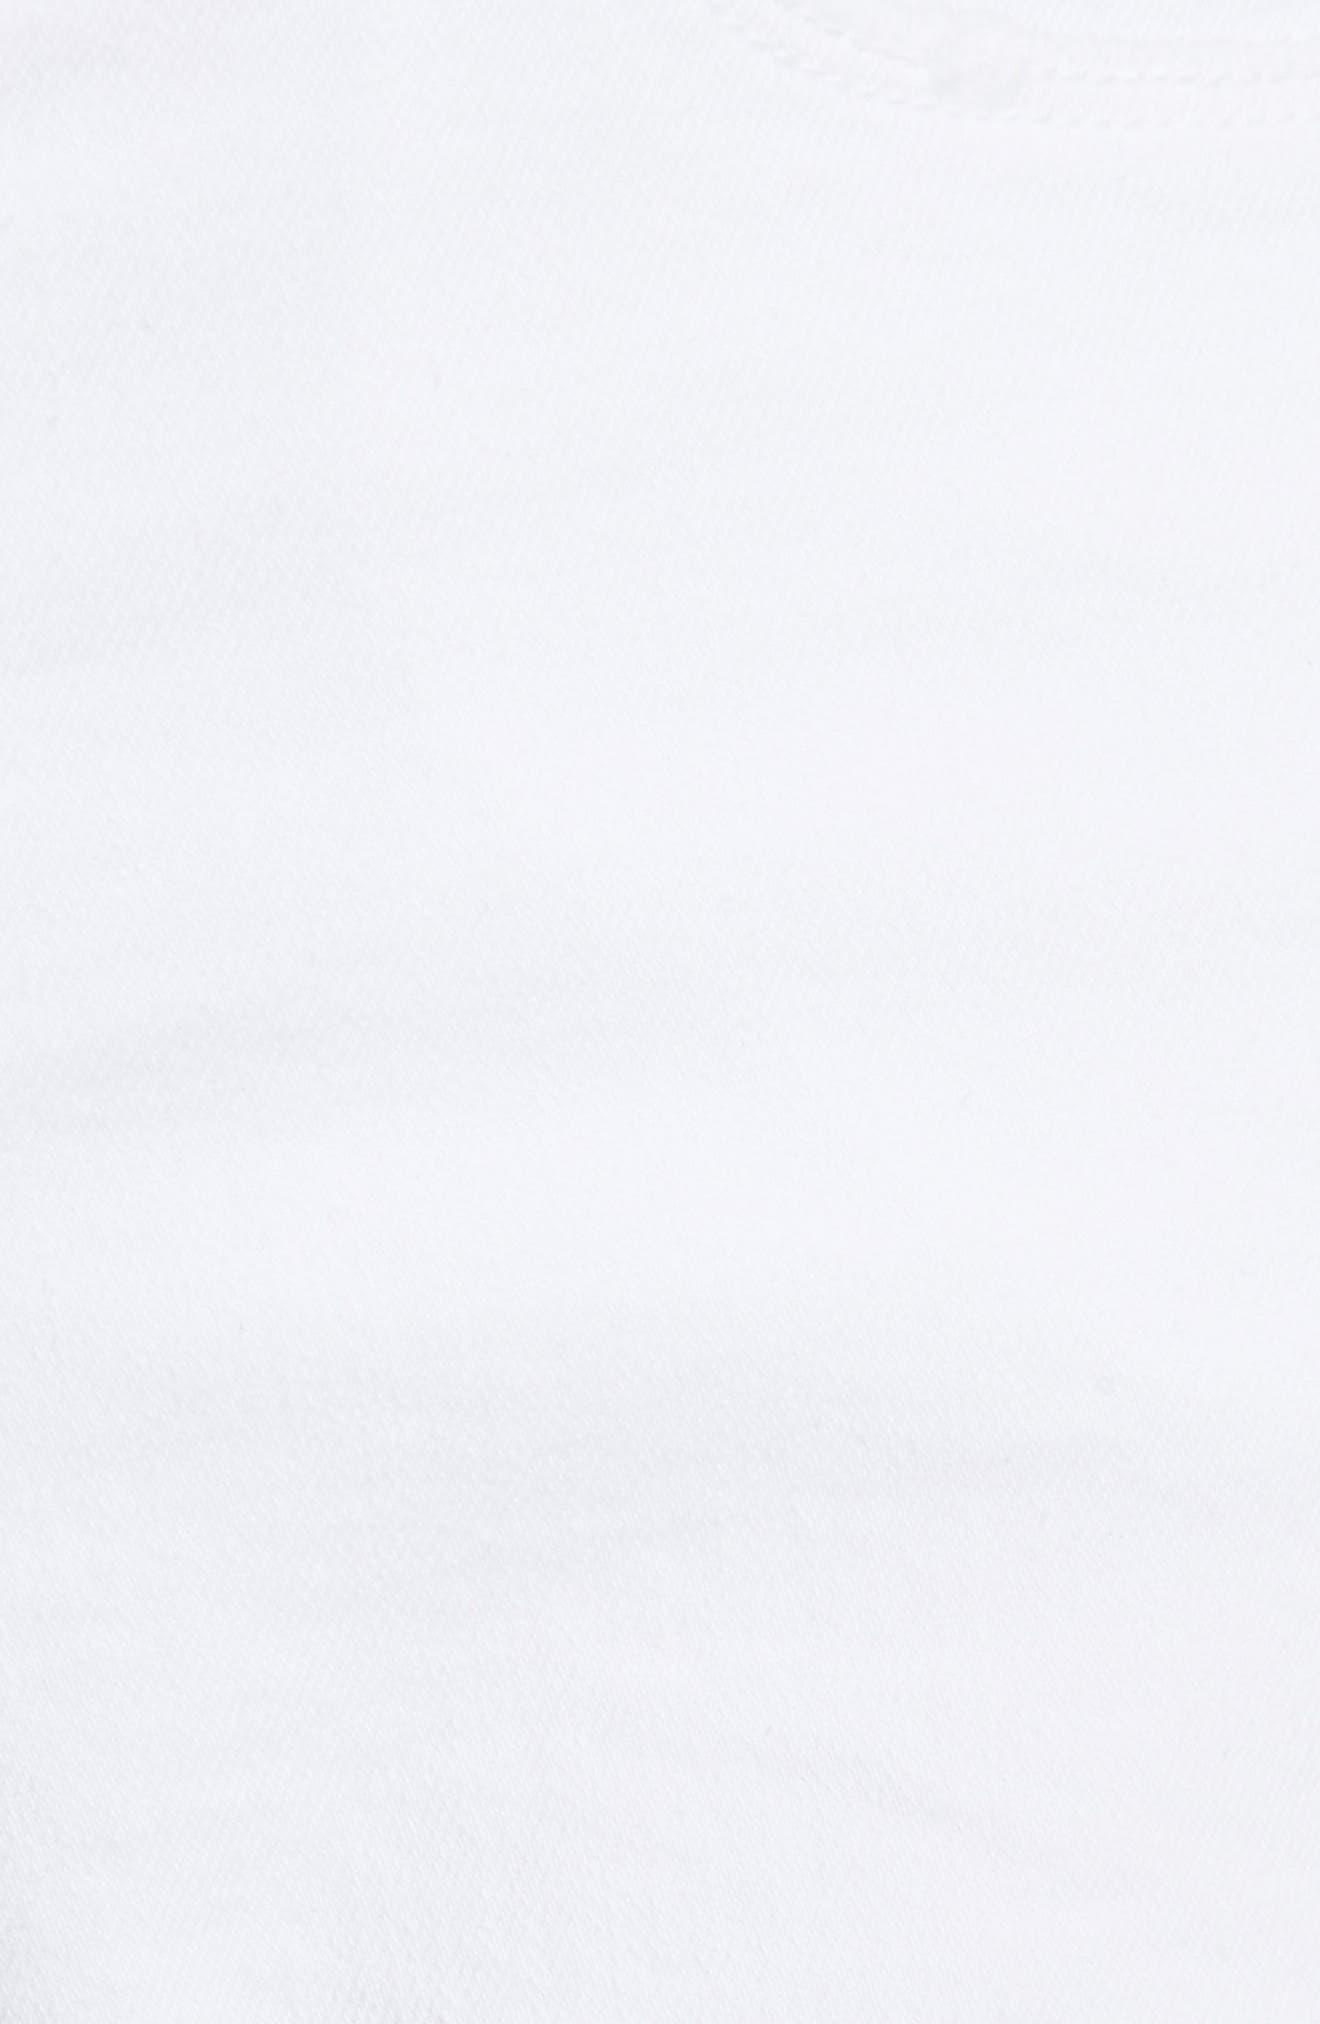 Le Cutoff Cuffed Jean Shorts,                             Alternate thumbnail 6, color,                             BLANC ROOKLEY